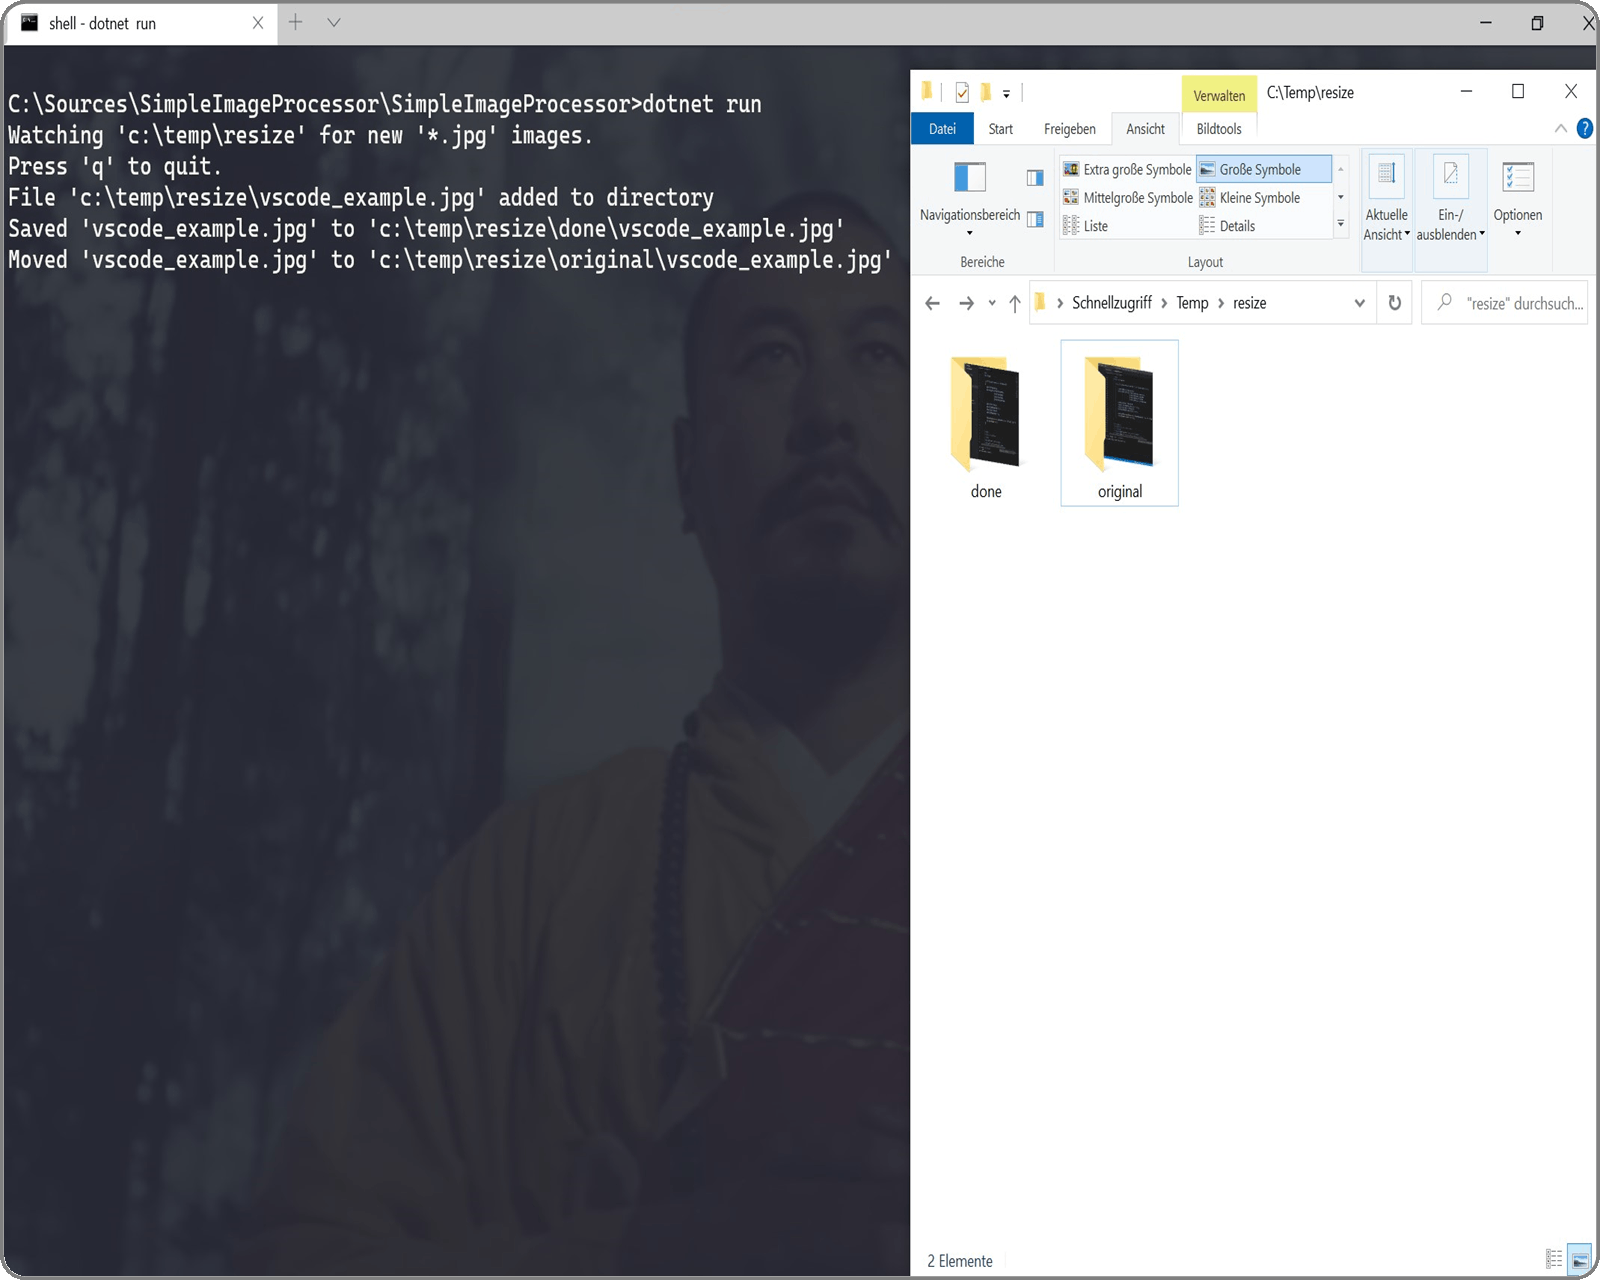 terminal_running_service.jpg